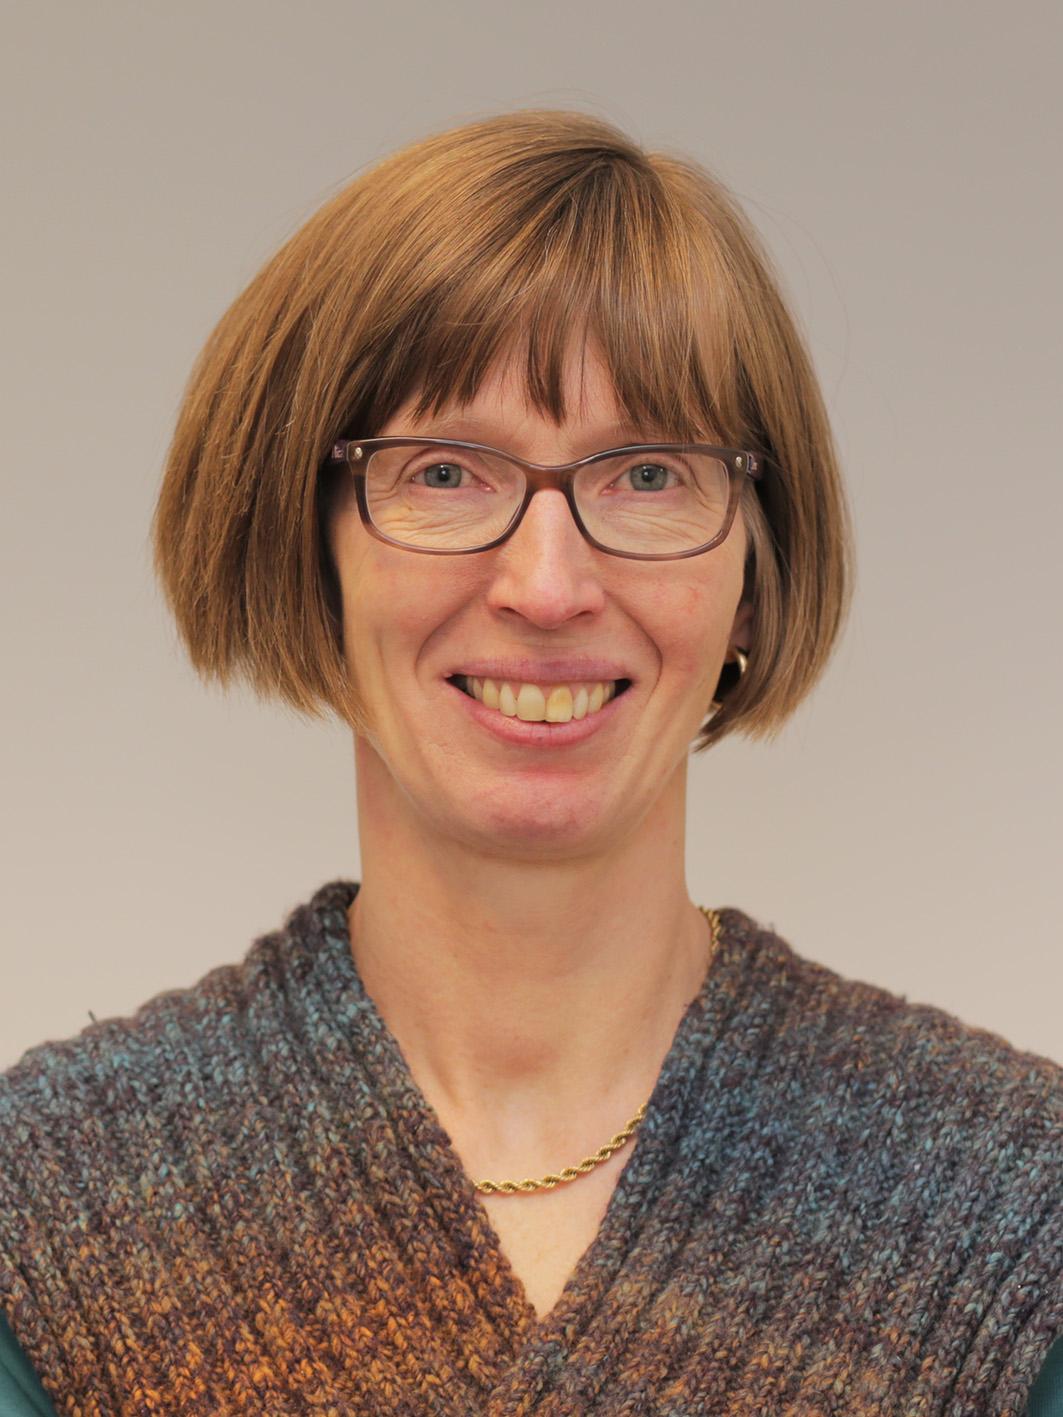 Inge Langhave